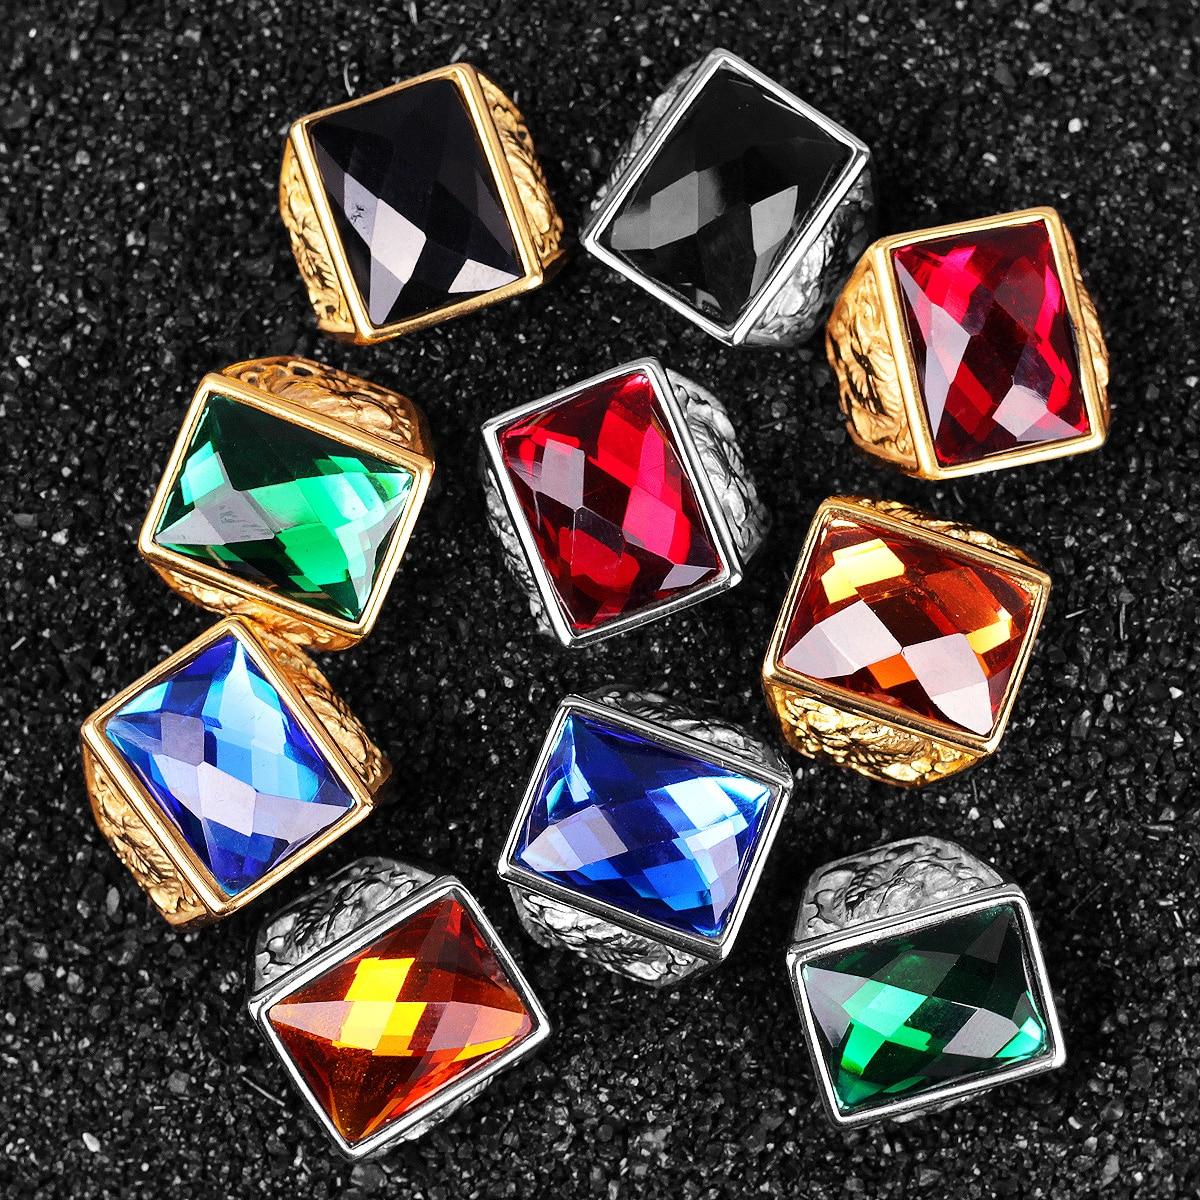 Stainless Steel Men Rings Rhinestone Dragon Phoenix Luxury Rich Unique Amulet for Male Boy Jewelry Creativity Gift Wholesale